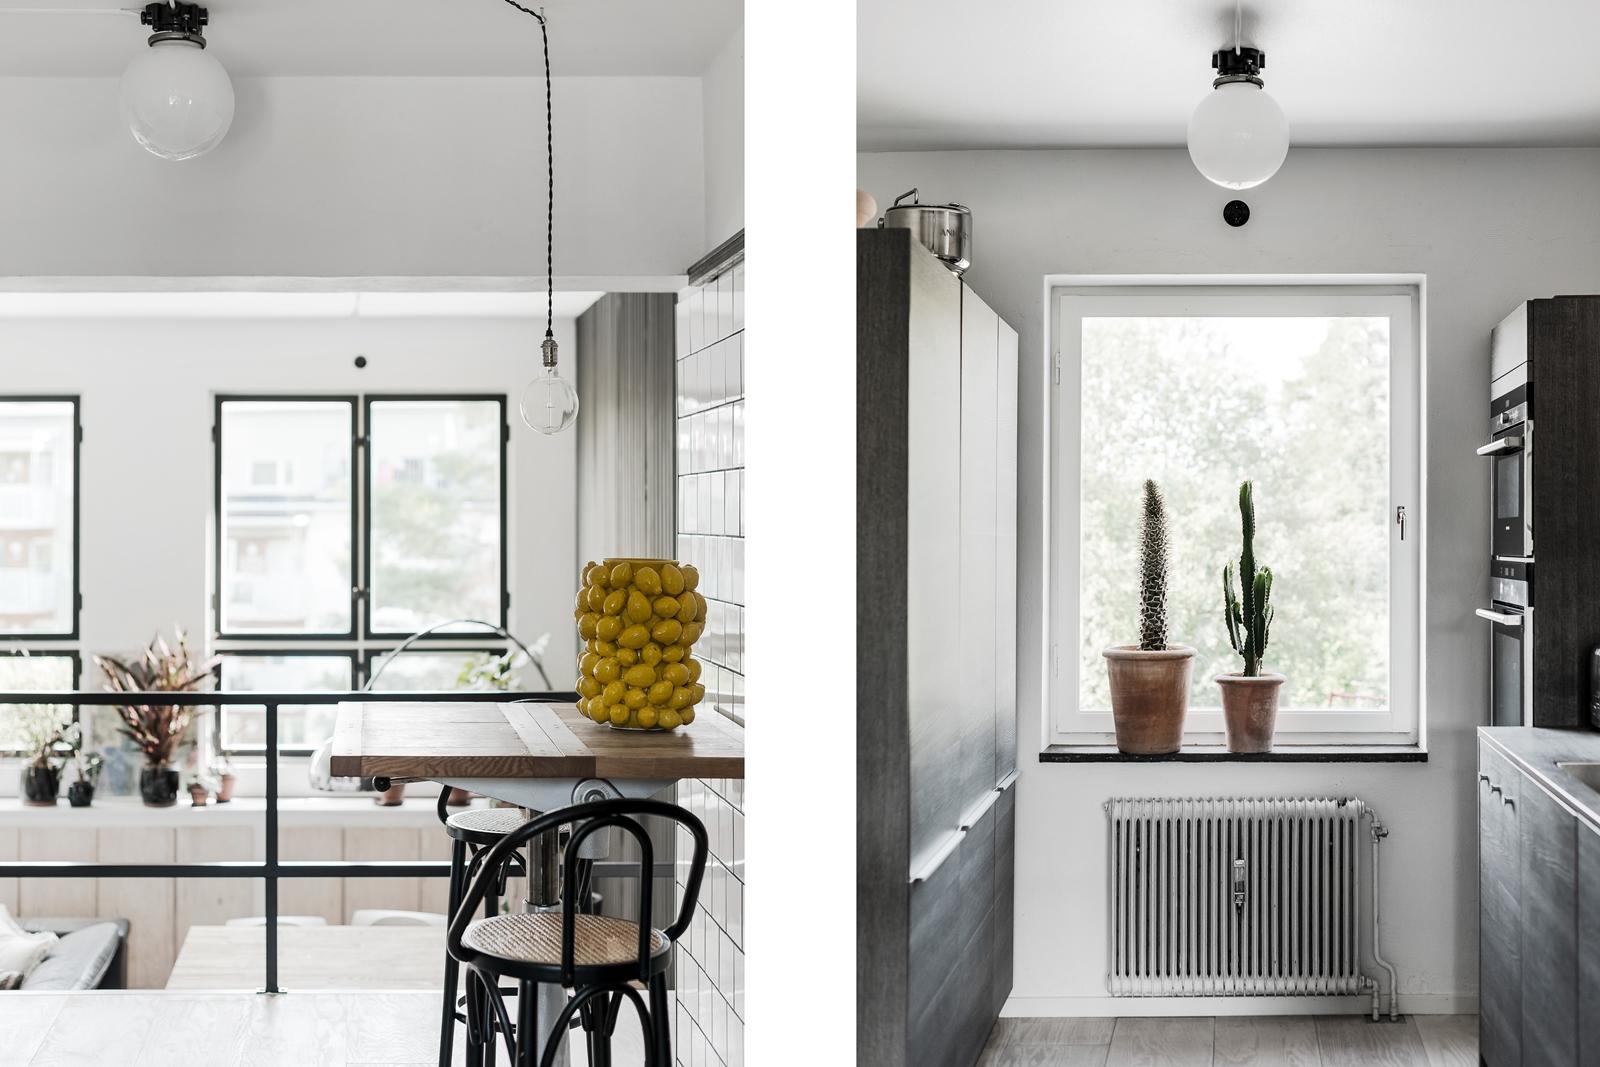 стол кухня встроенная техника окно